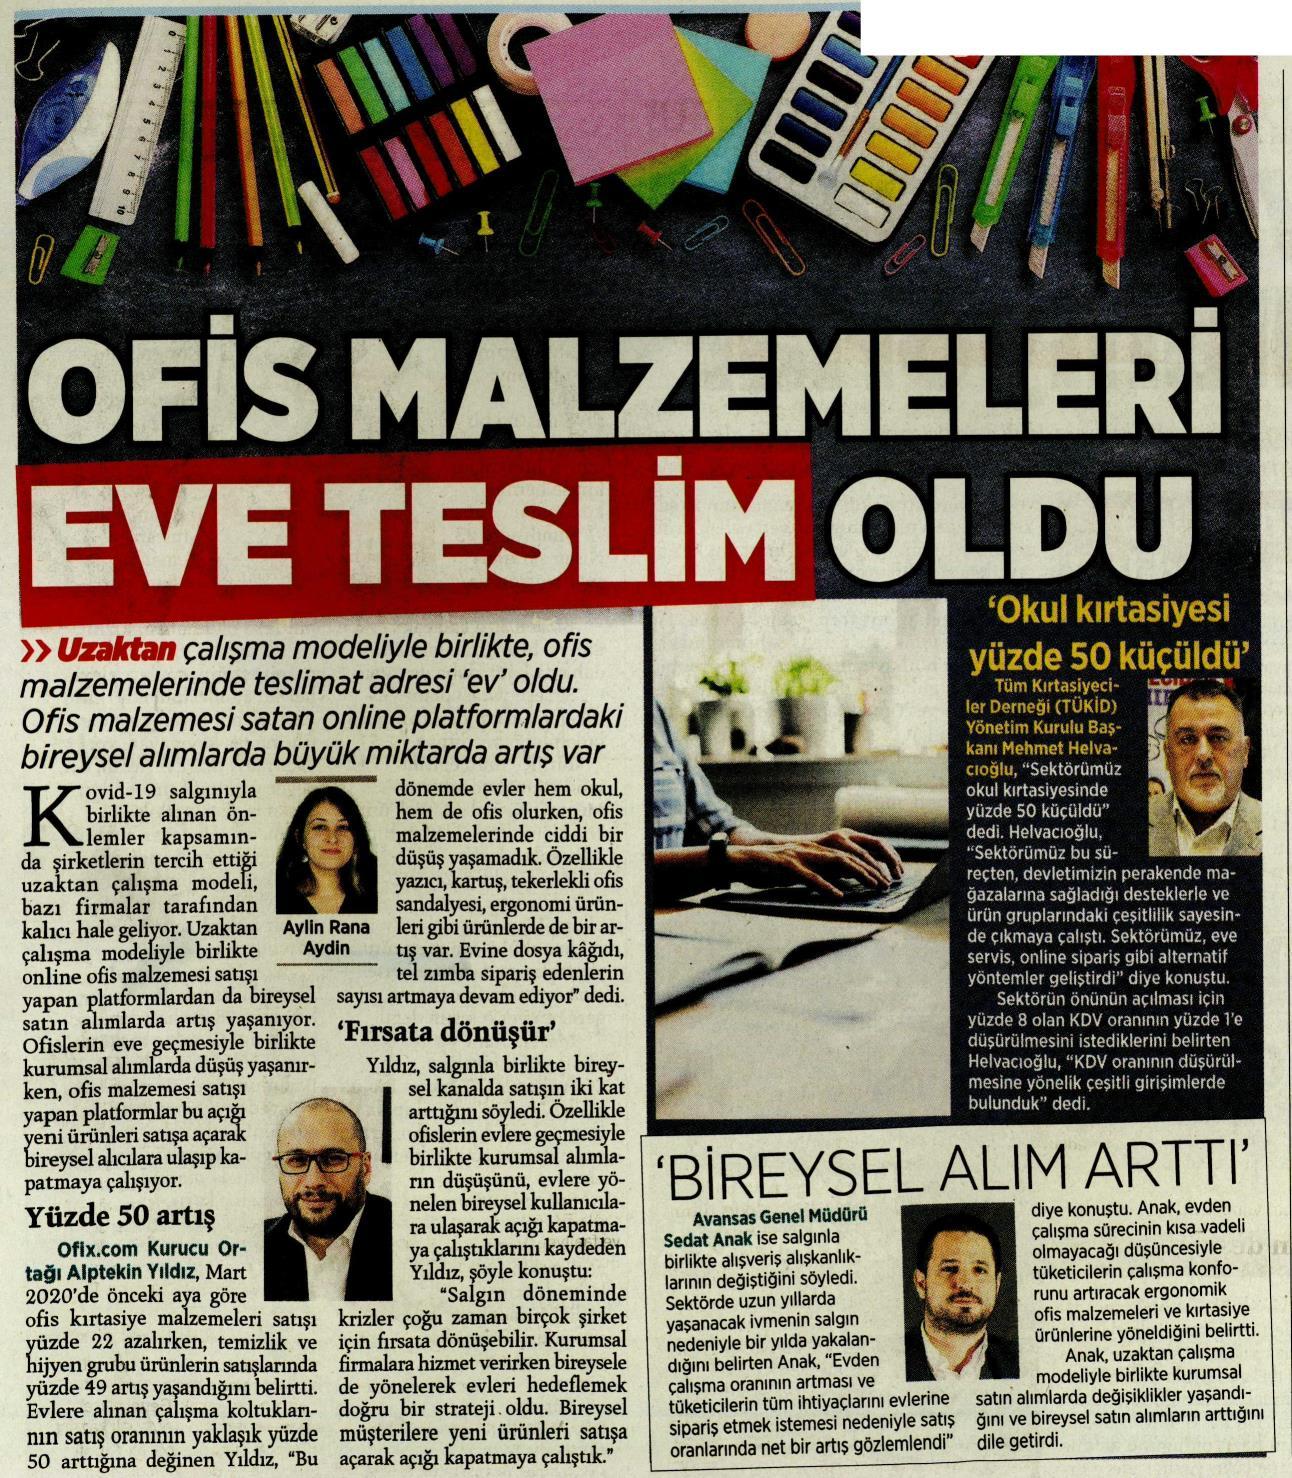 Milliyet / Ofix.com